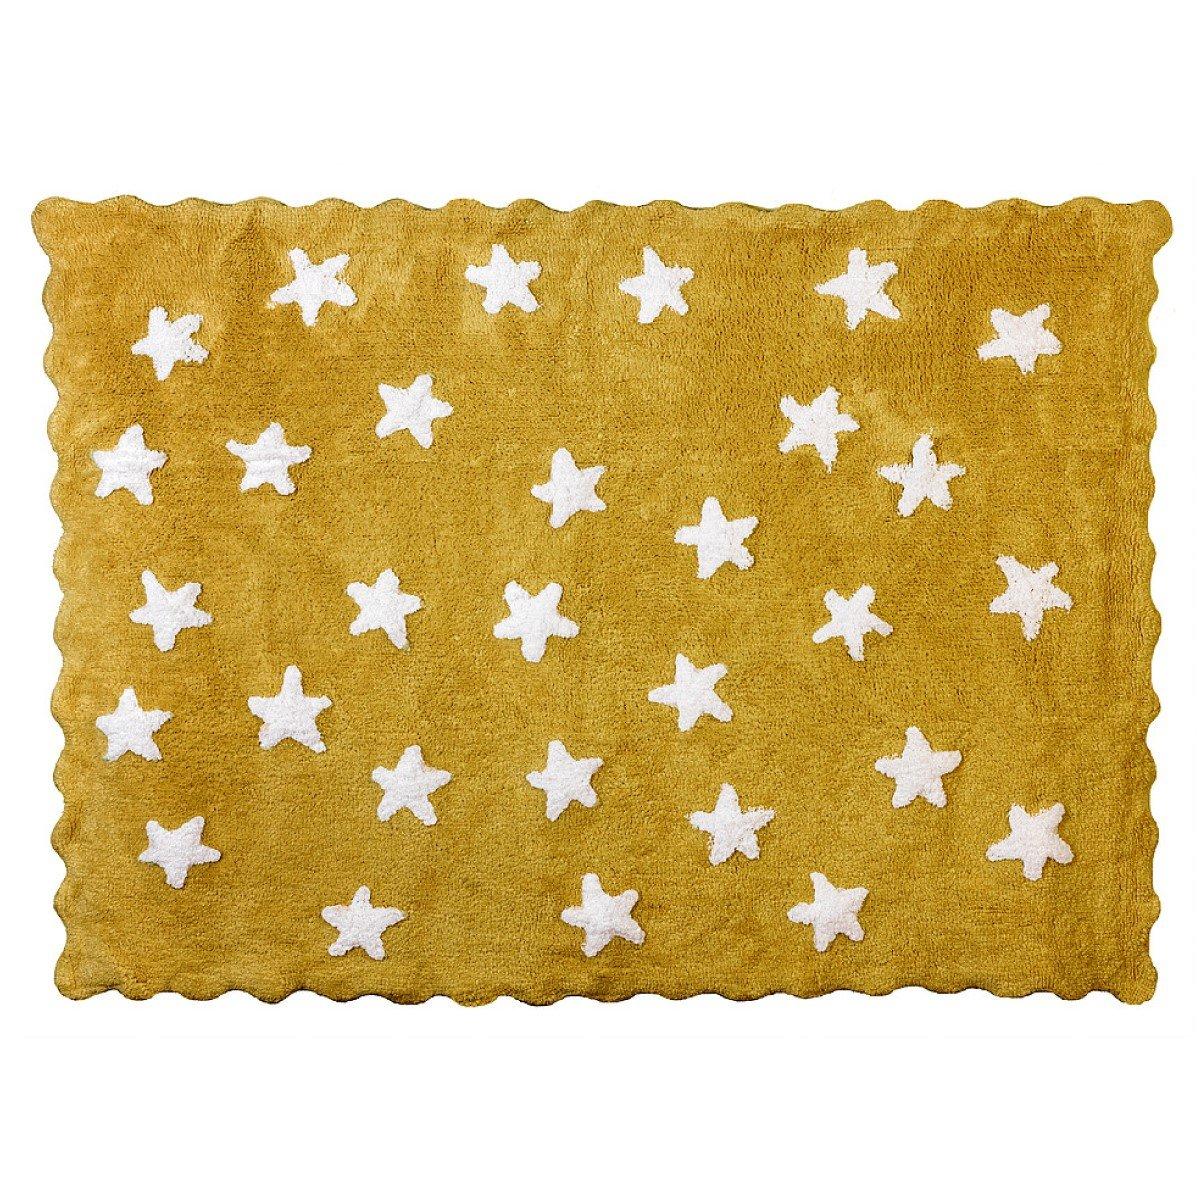 Lilipouce Alfombra infantil algodón estrellas Eden, tela, Rose, 120x160 cm